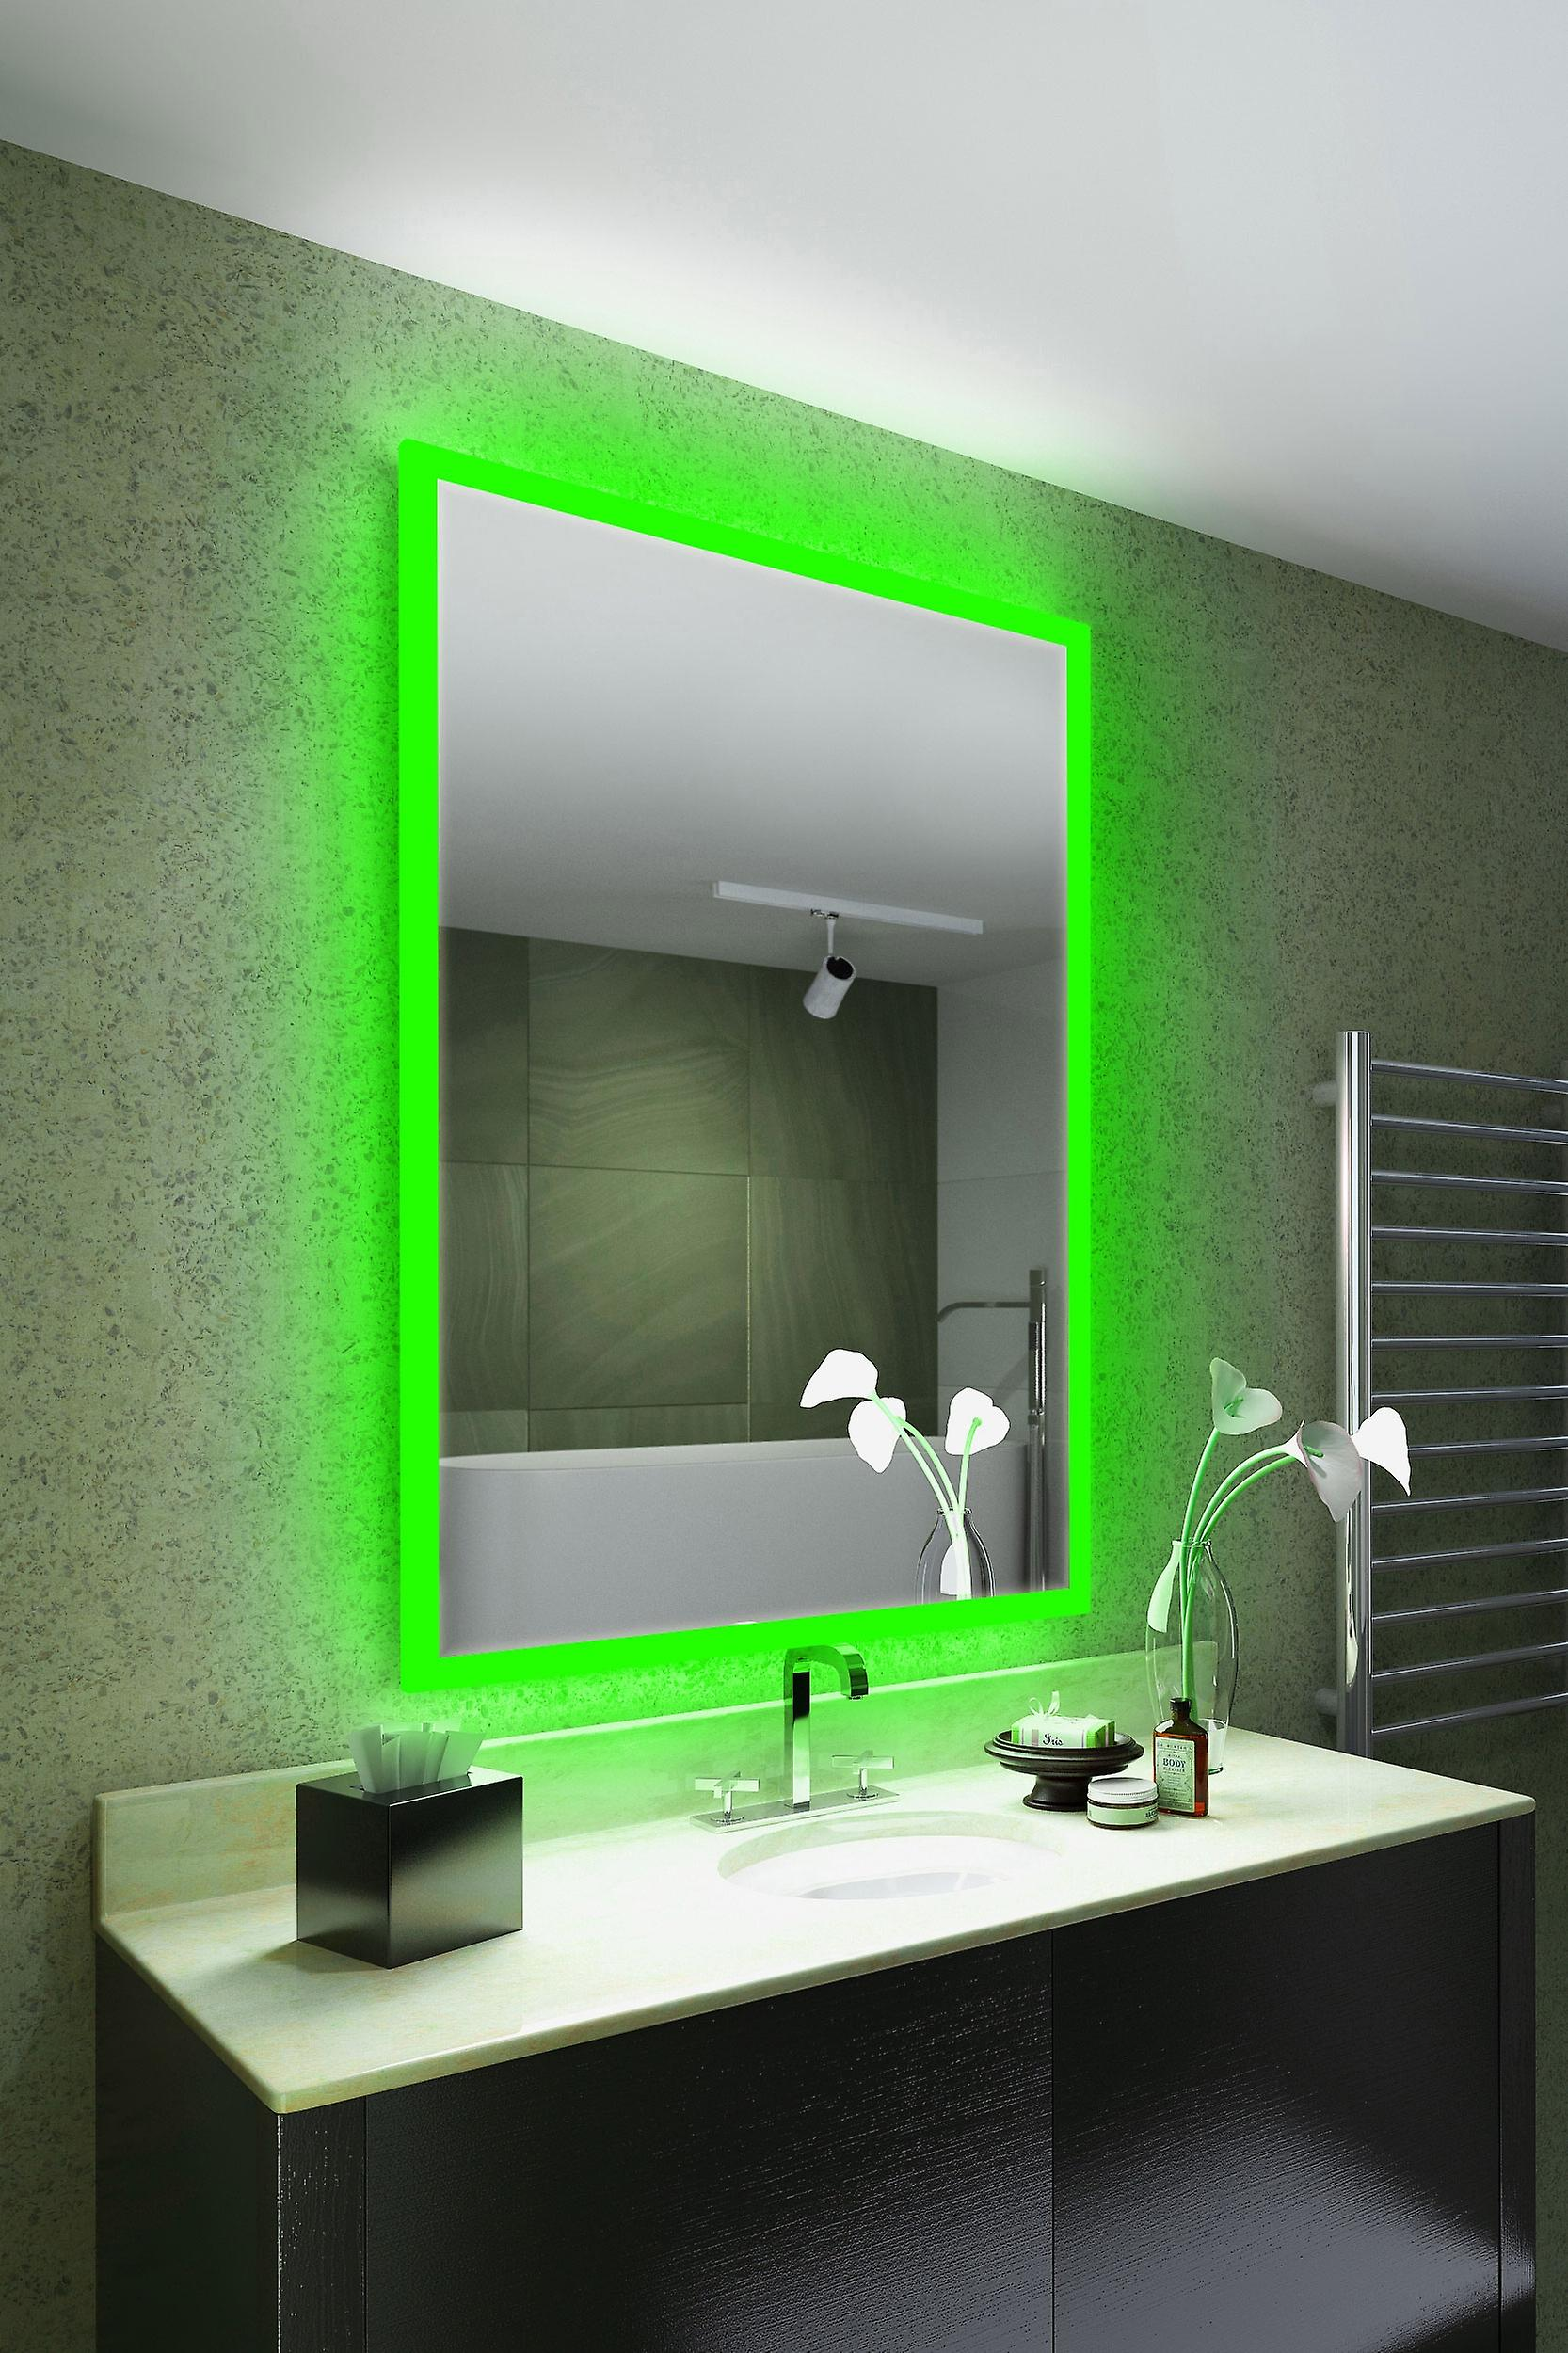 RGB Audio Shaver Mirror with Bluetooth Demist Sensor K842ivrgbaud